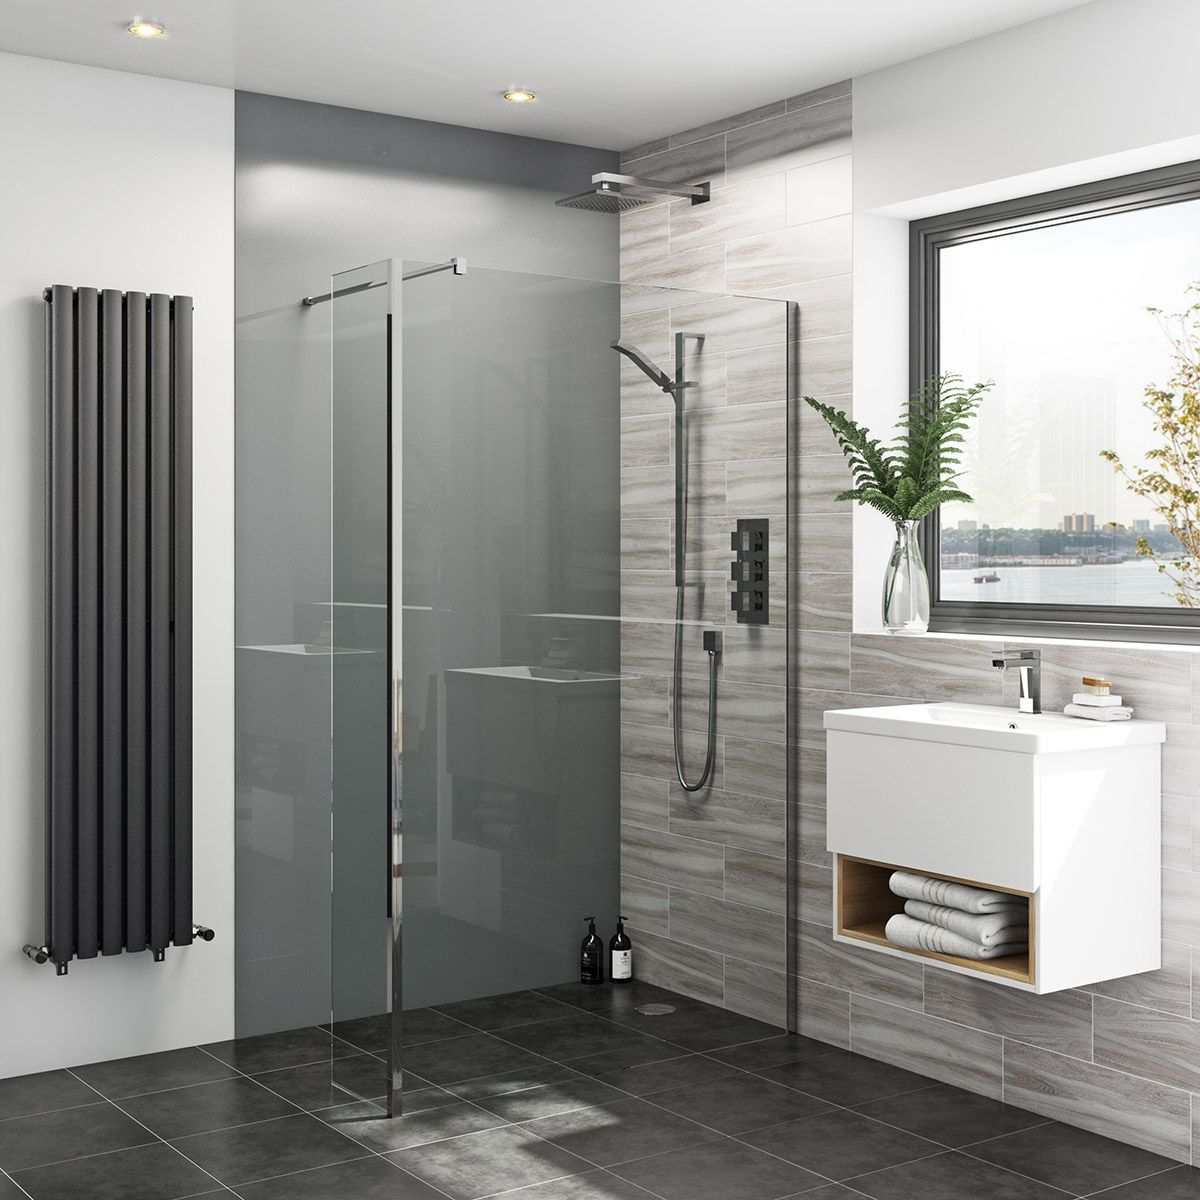 zenolite plus ash acrylic shower wall panel 2440 x 1220 on shower wall panels id=84696